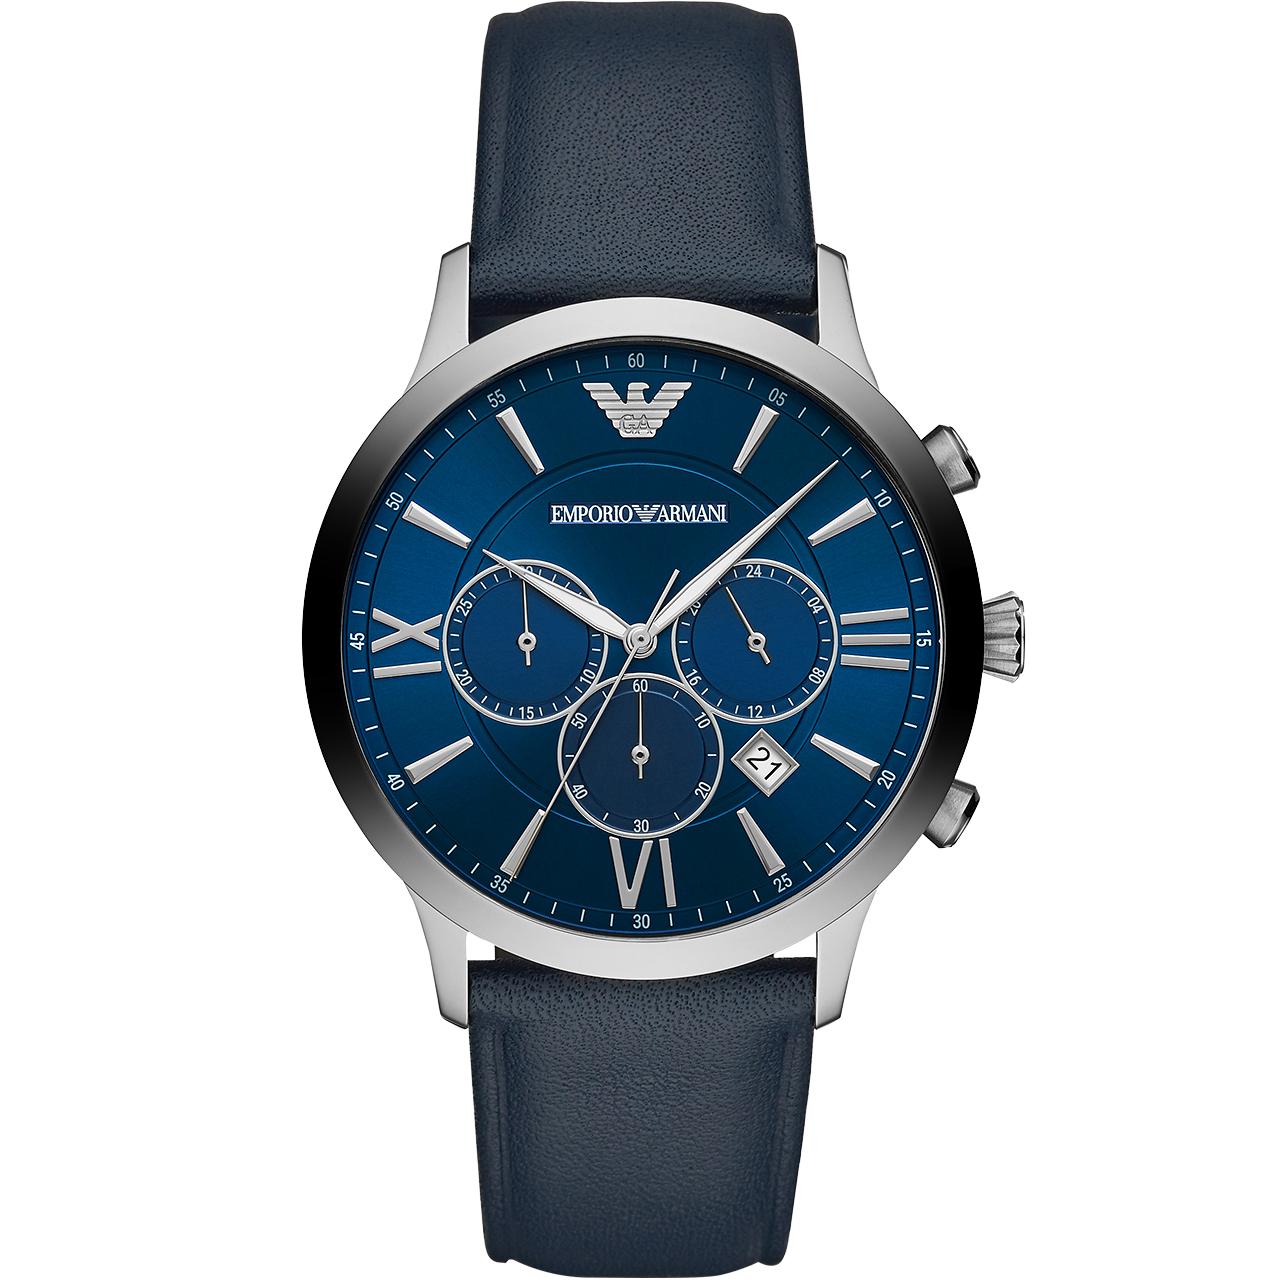 Armani阿玛尼官方正品蓝色表盘皮带手表男潮 时尚石英腕表AR11226